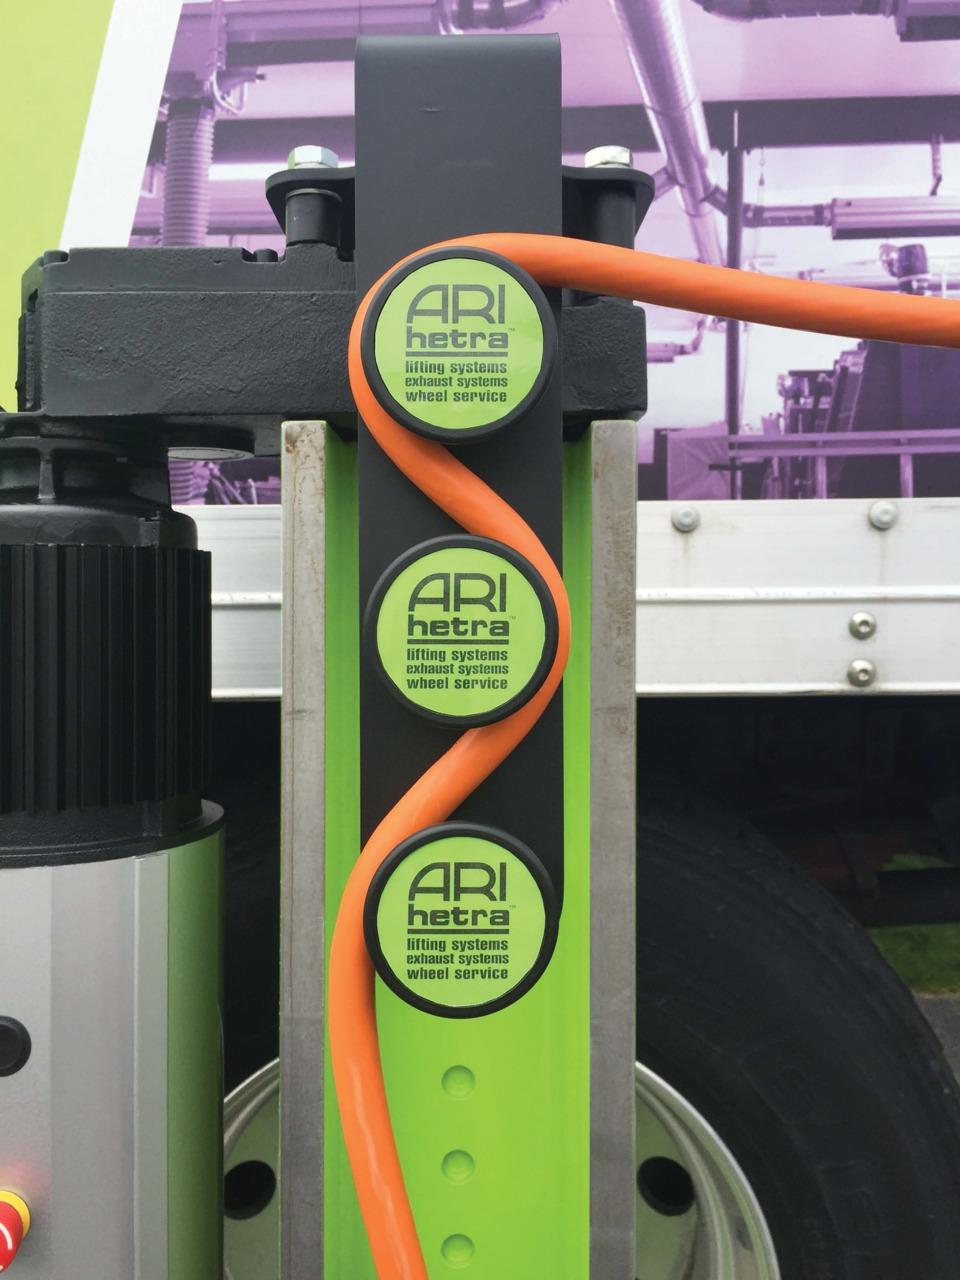 Ari Hetra Elevate Heavy Duty Mobile Lift Maintenance Cable